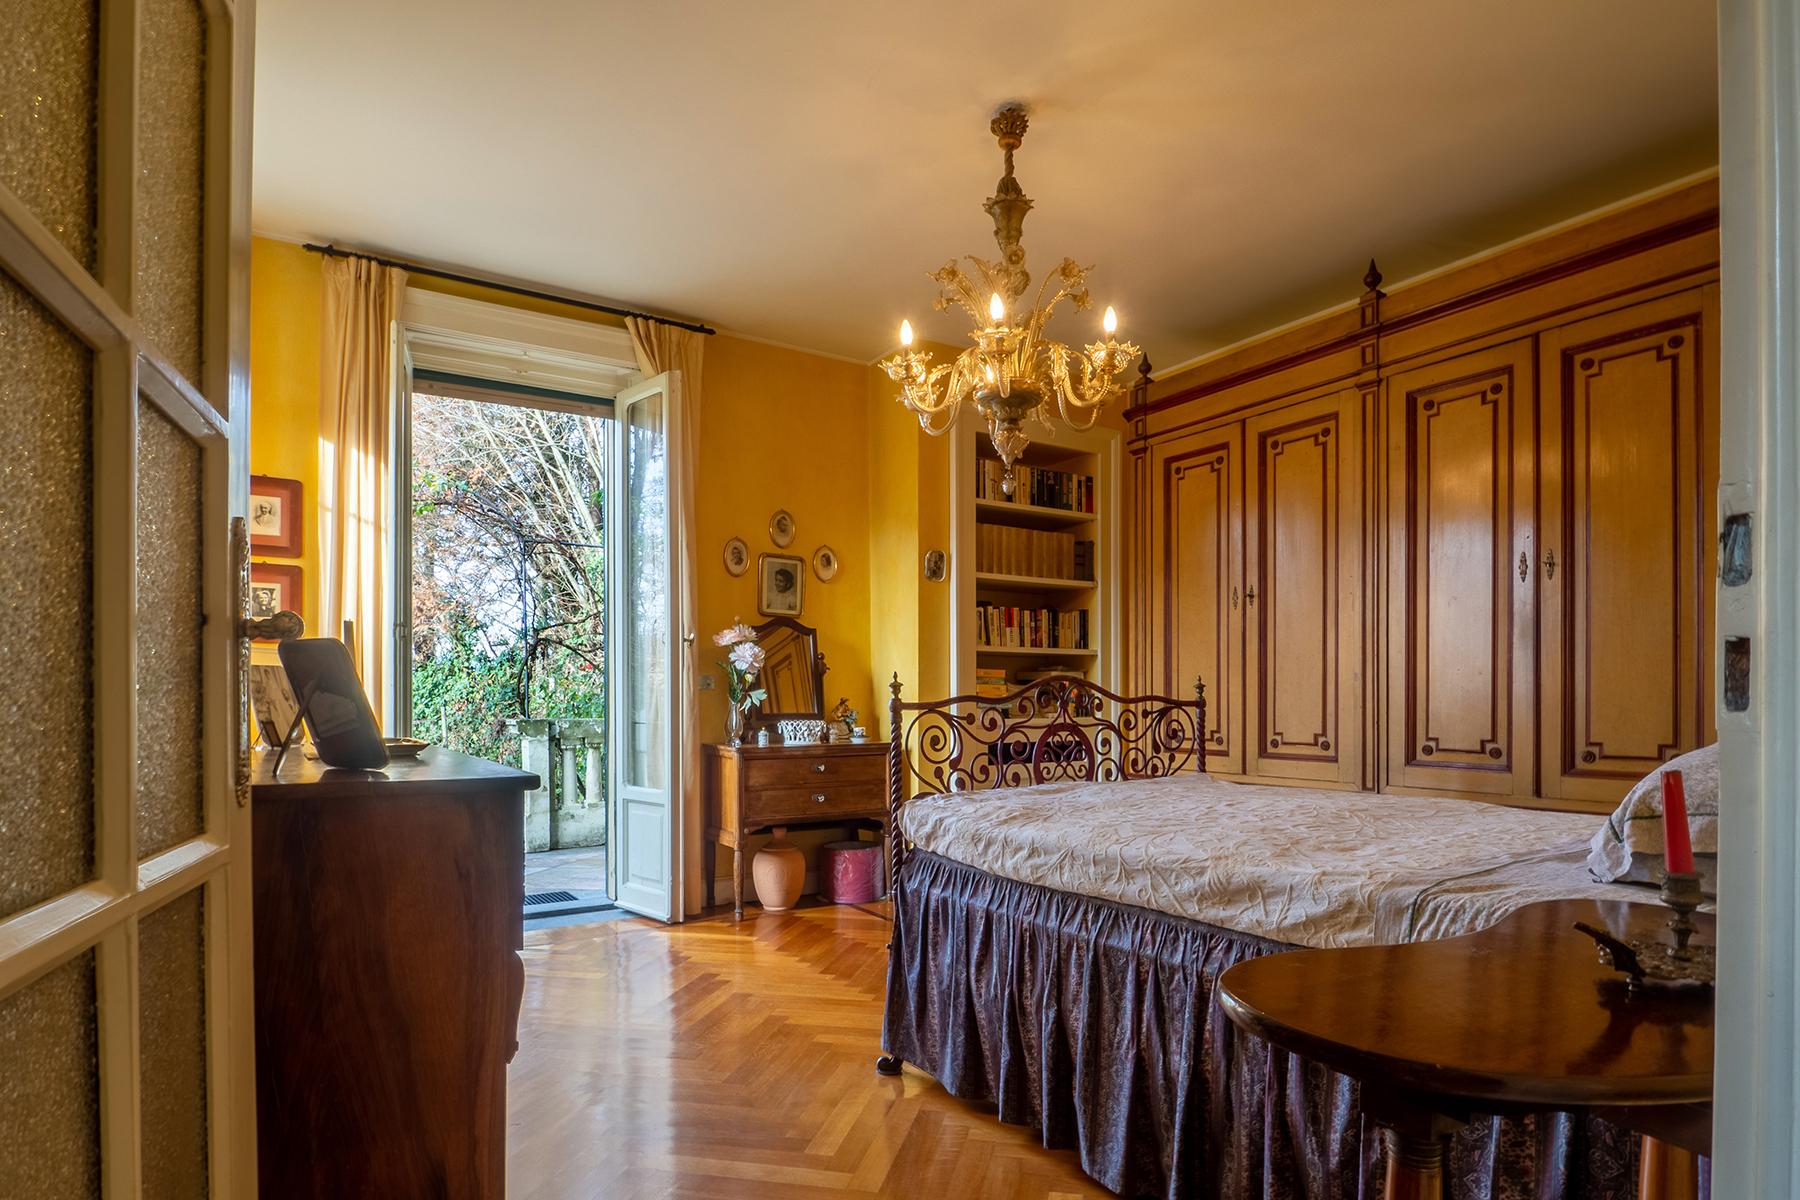 Casa indipendente in Vendita a Torino: 5 locali, 657 mq - Foto 15